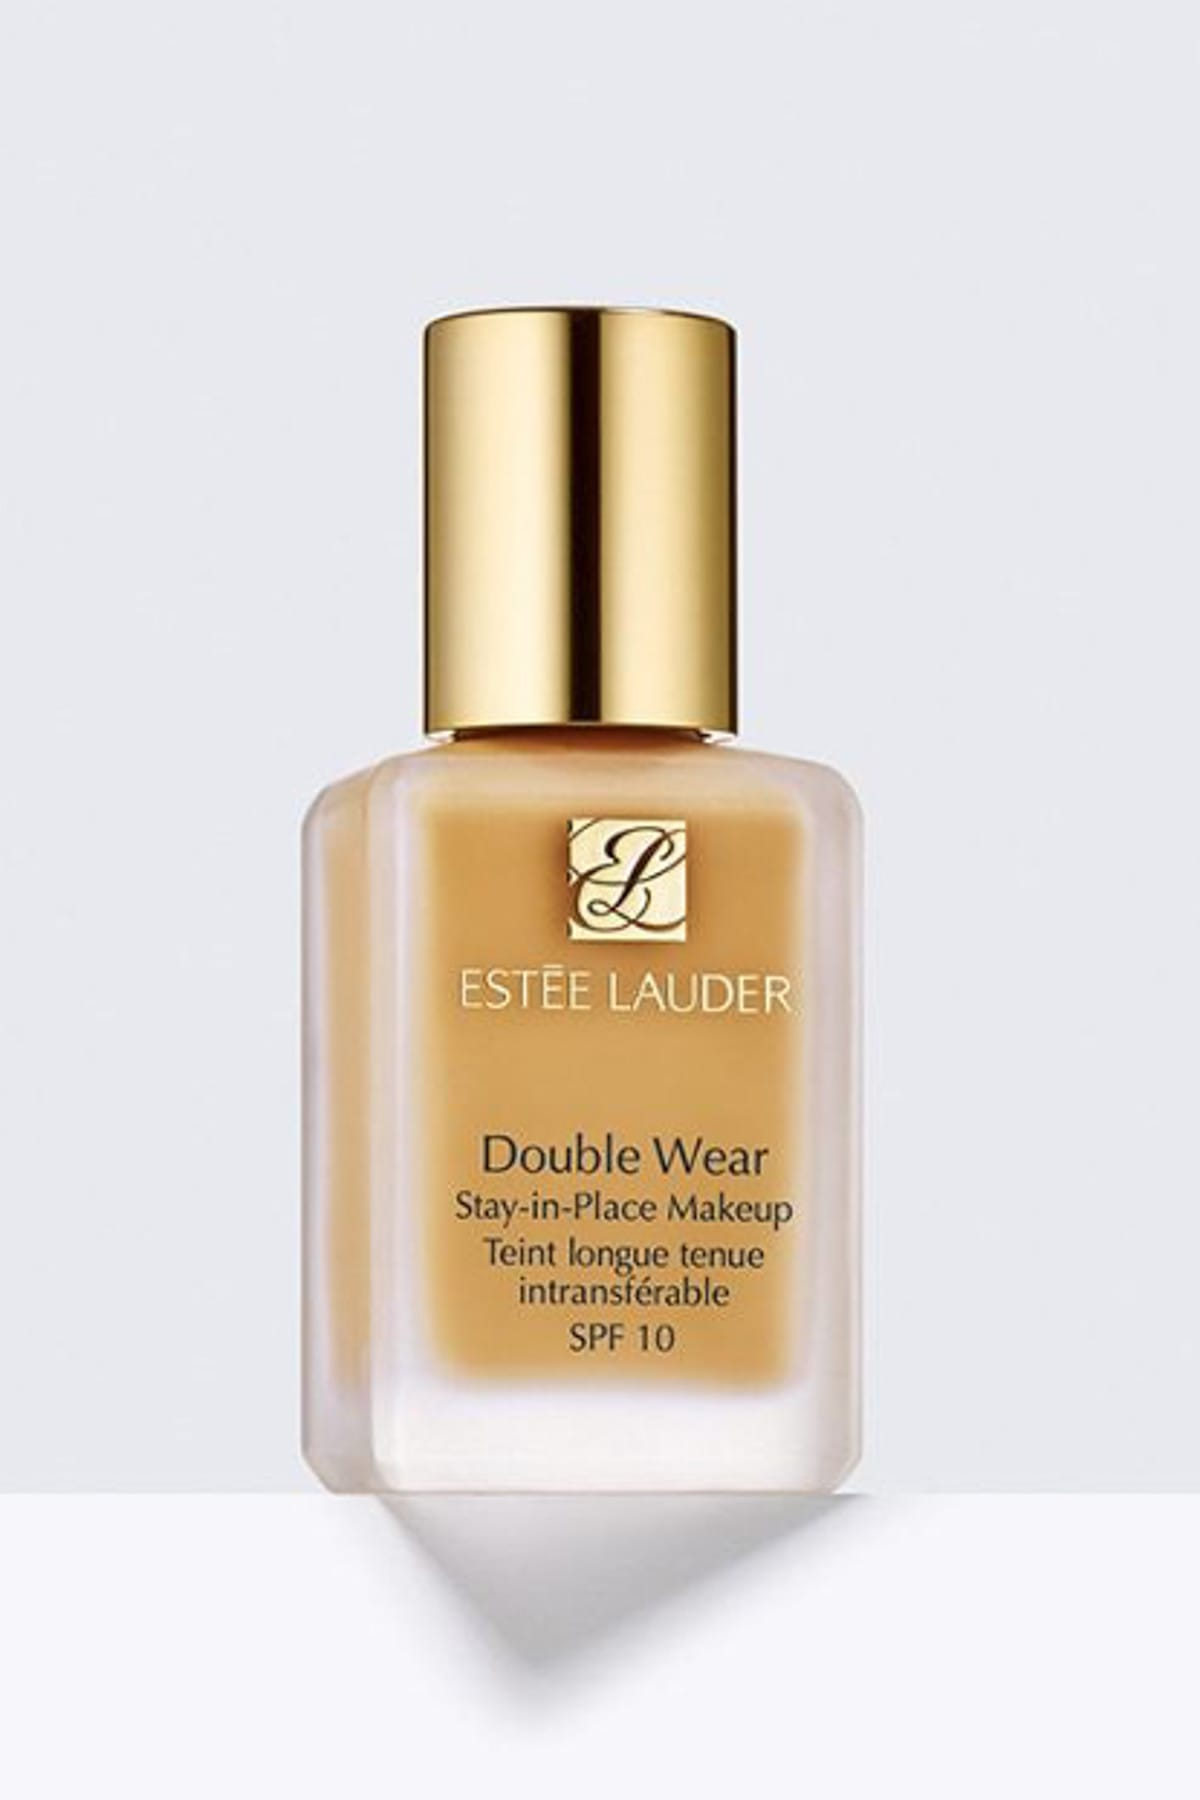 Estee Lauder Fondöten - Double Wear Foundation S.I.P Spf10 2W1.5 Natural Suede 30 ml 887167418110 1